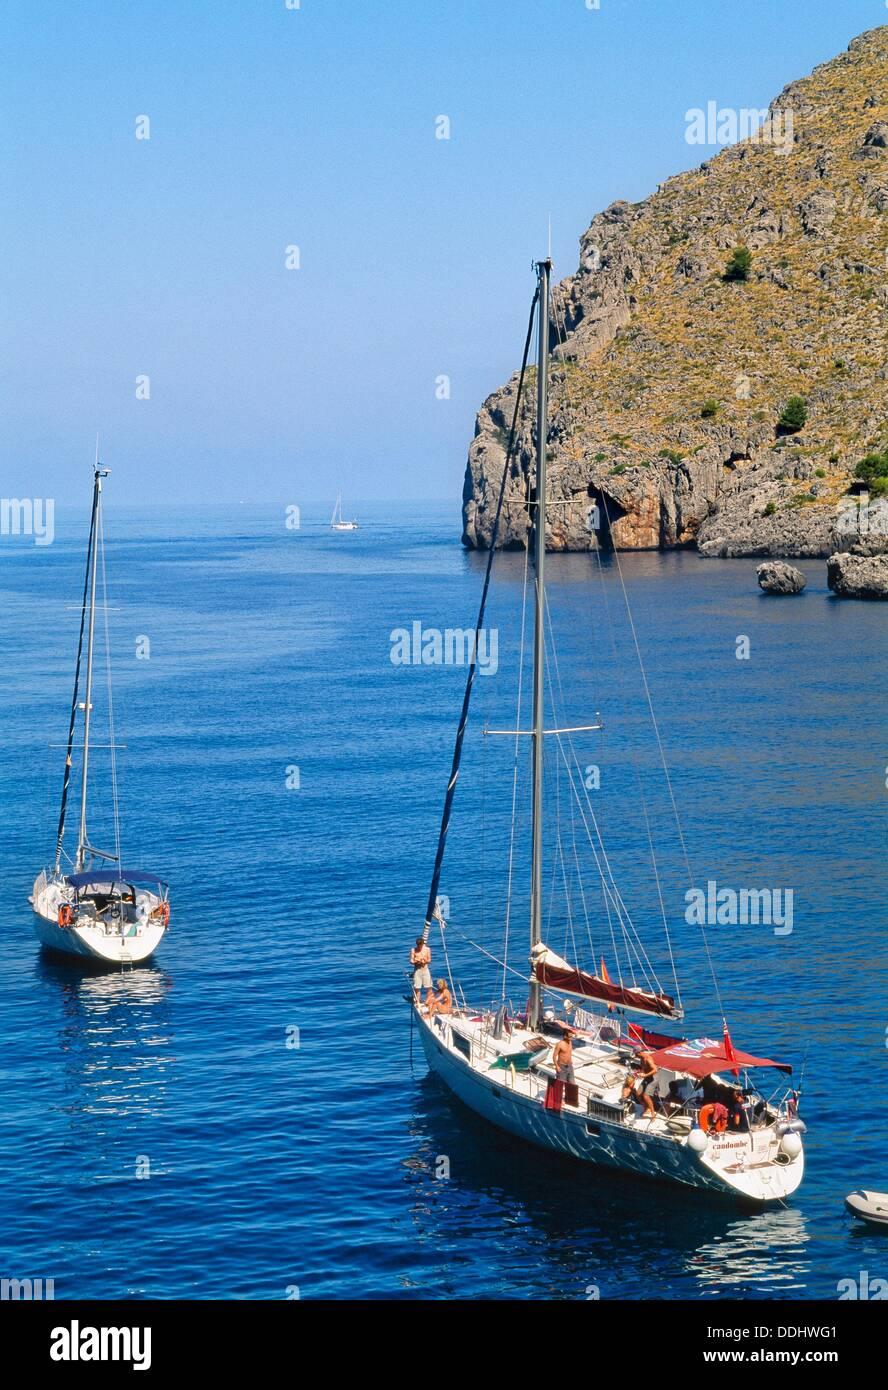 Boats in Sa Calobra, Majorca, Balearic Islands, Spain - Stock Image